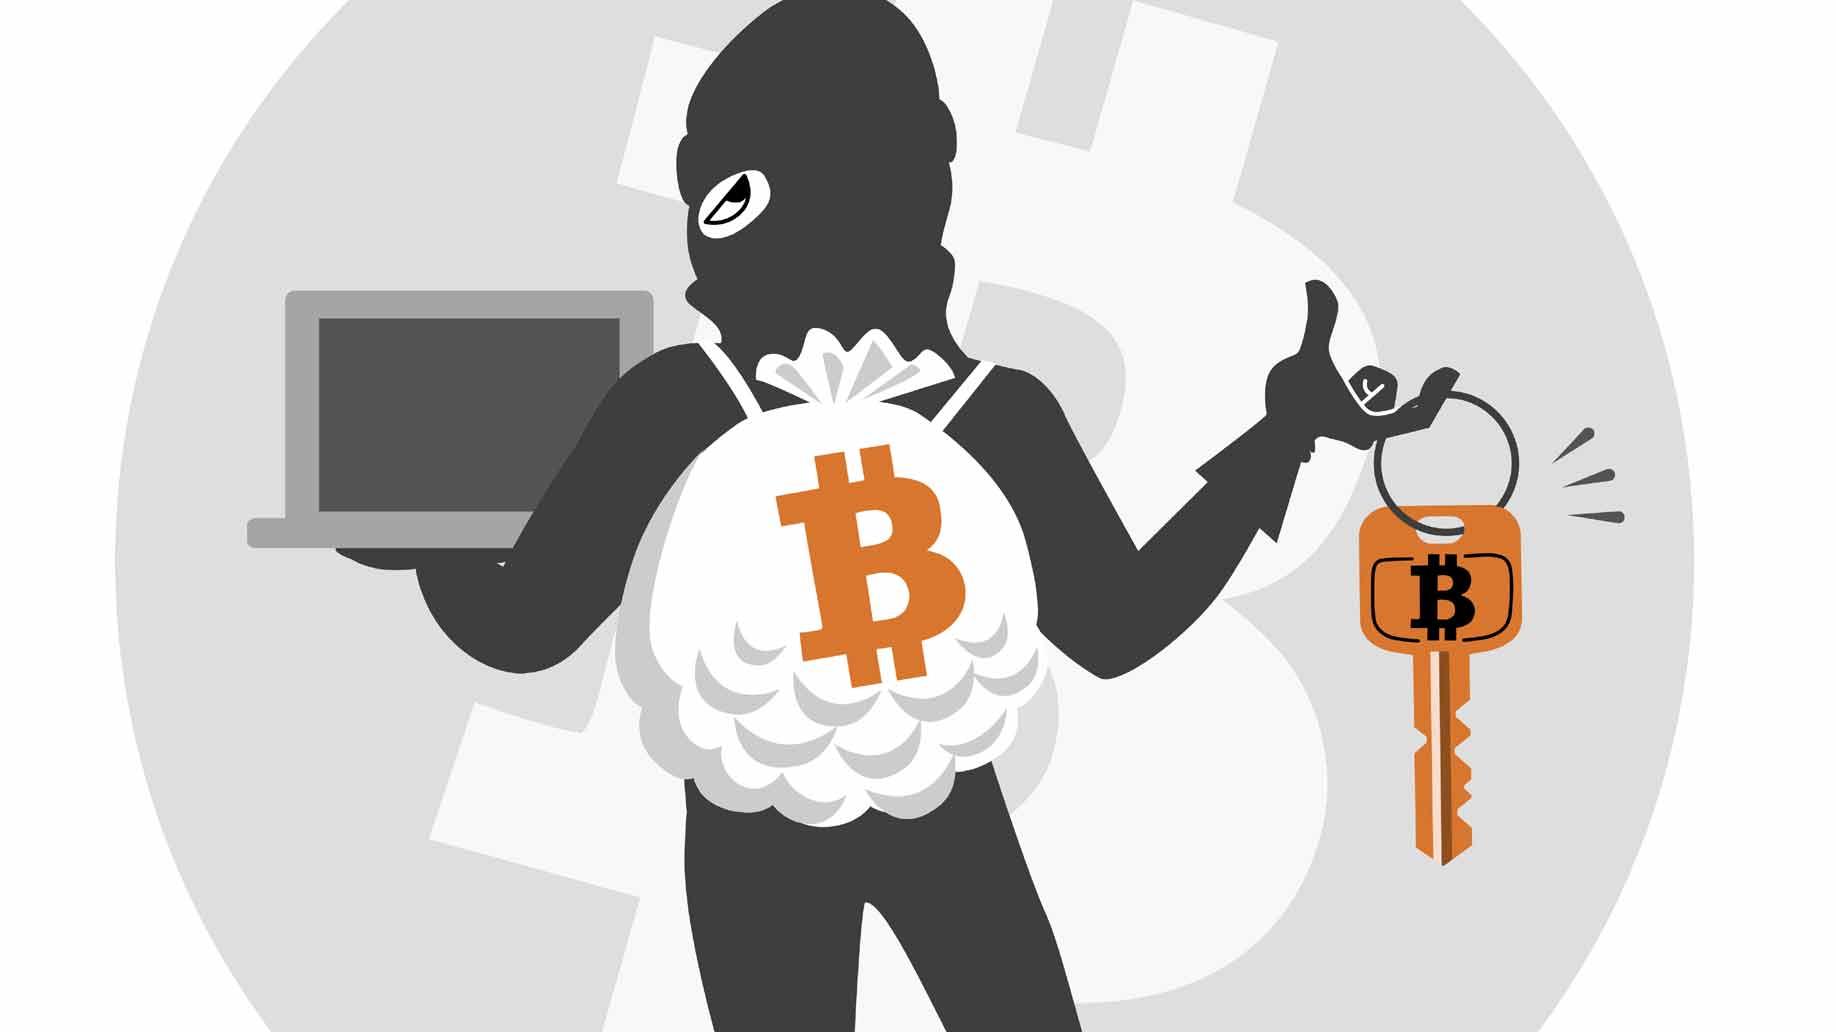 bitcointhief